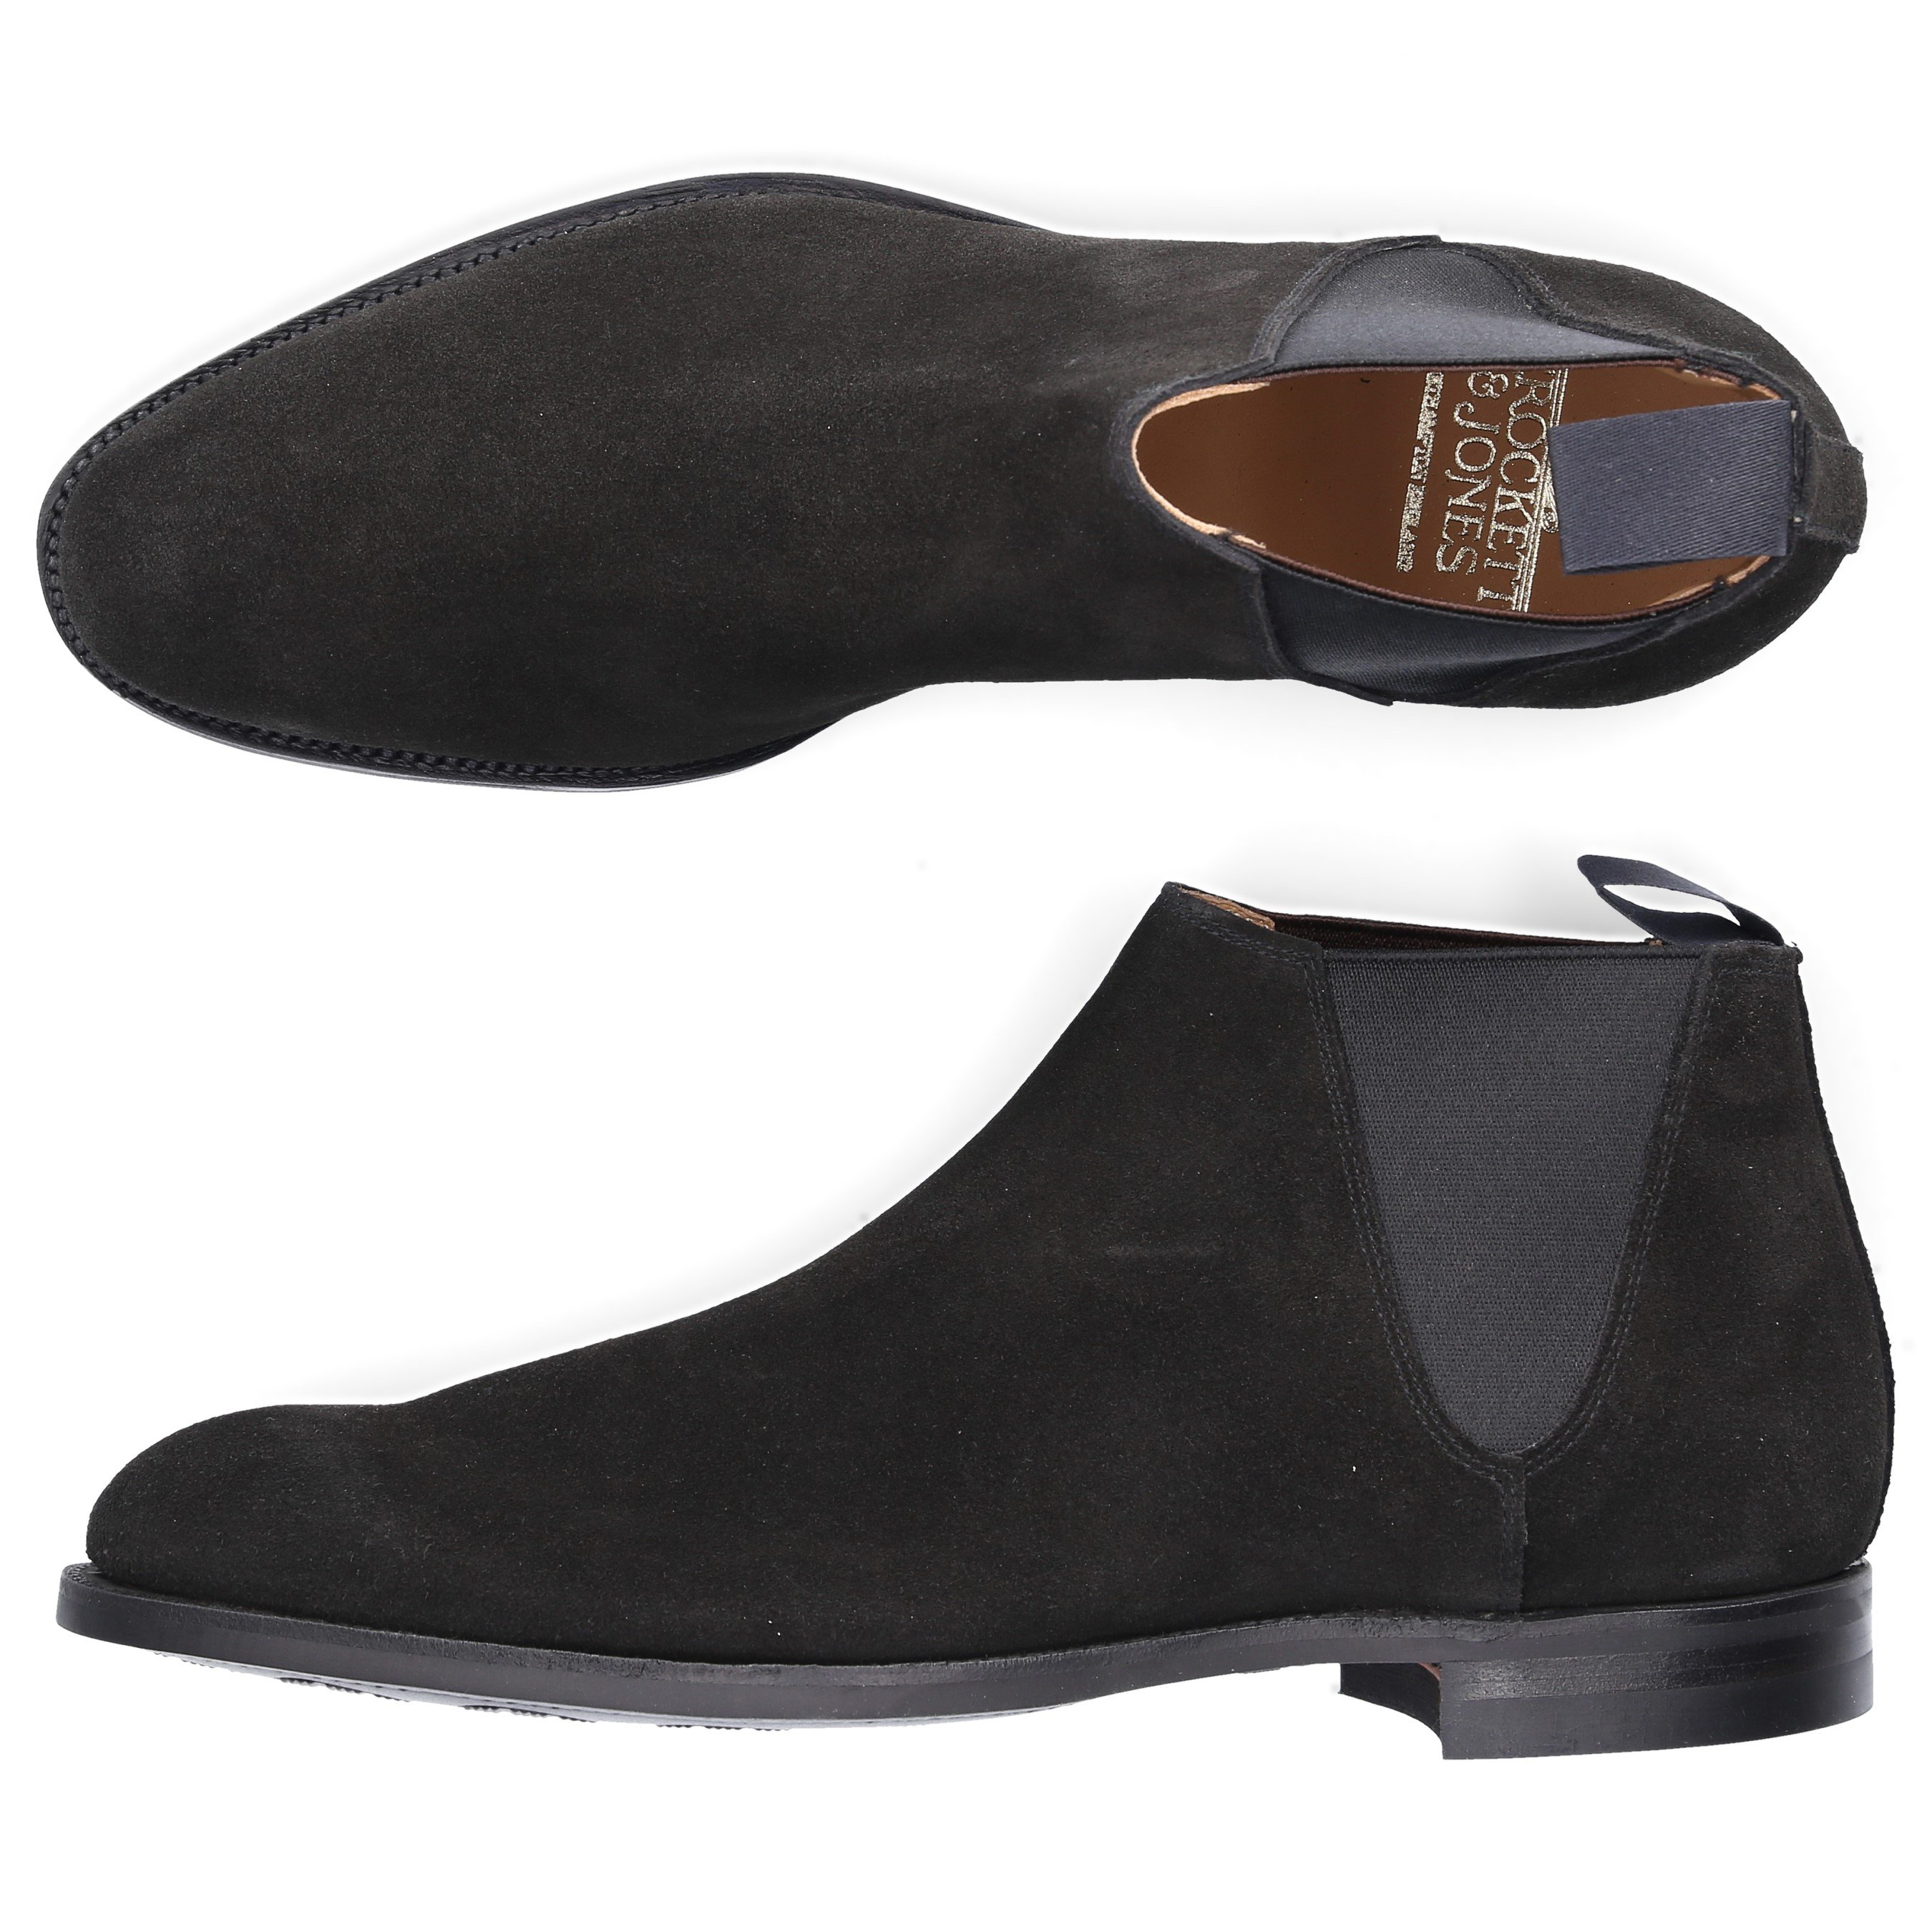 3b95864cd5e Chelsea Boots Cranleigh Suede Black